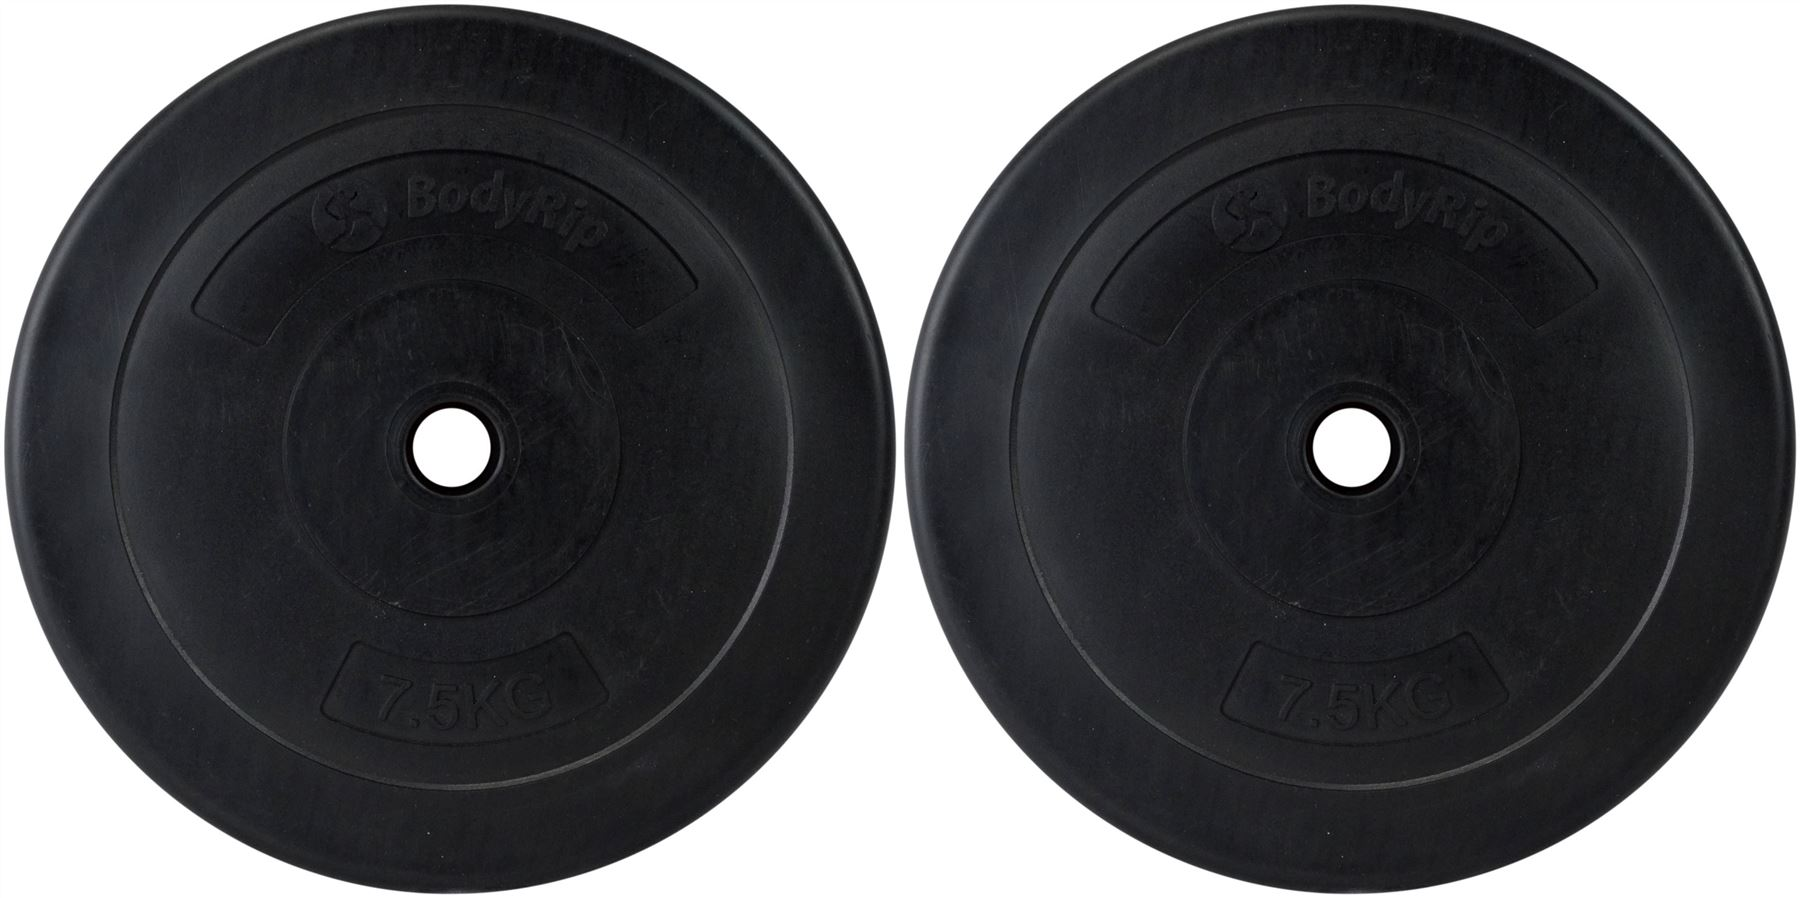 Bodyrip 1 Quot Standard 1 25 25kg Vinyl Weight Plates Discs